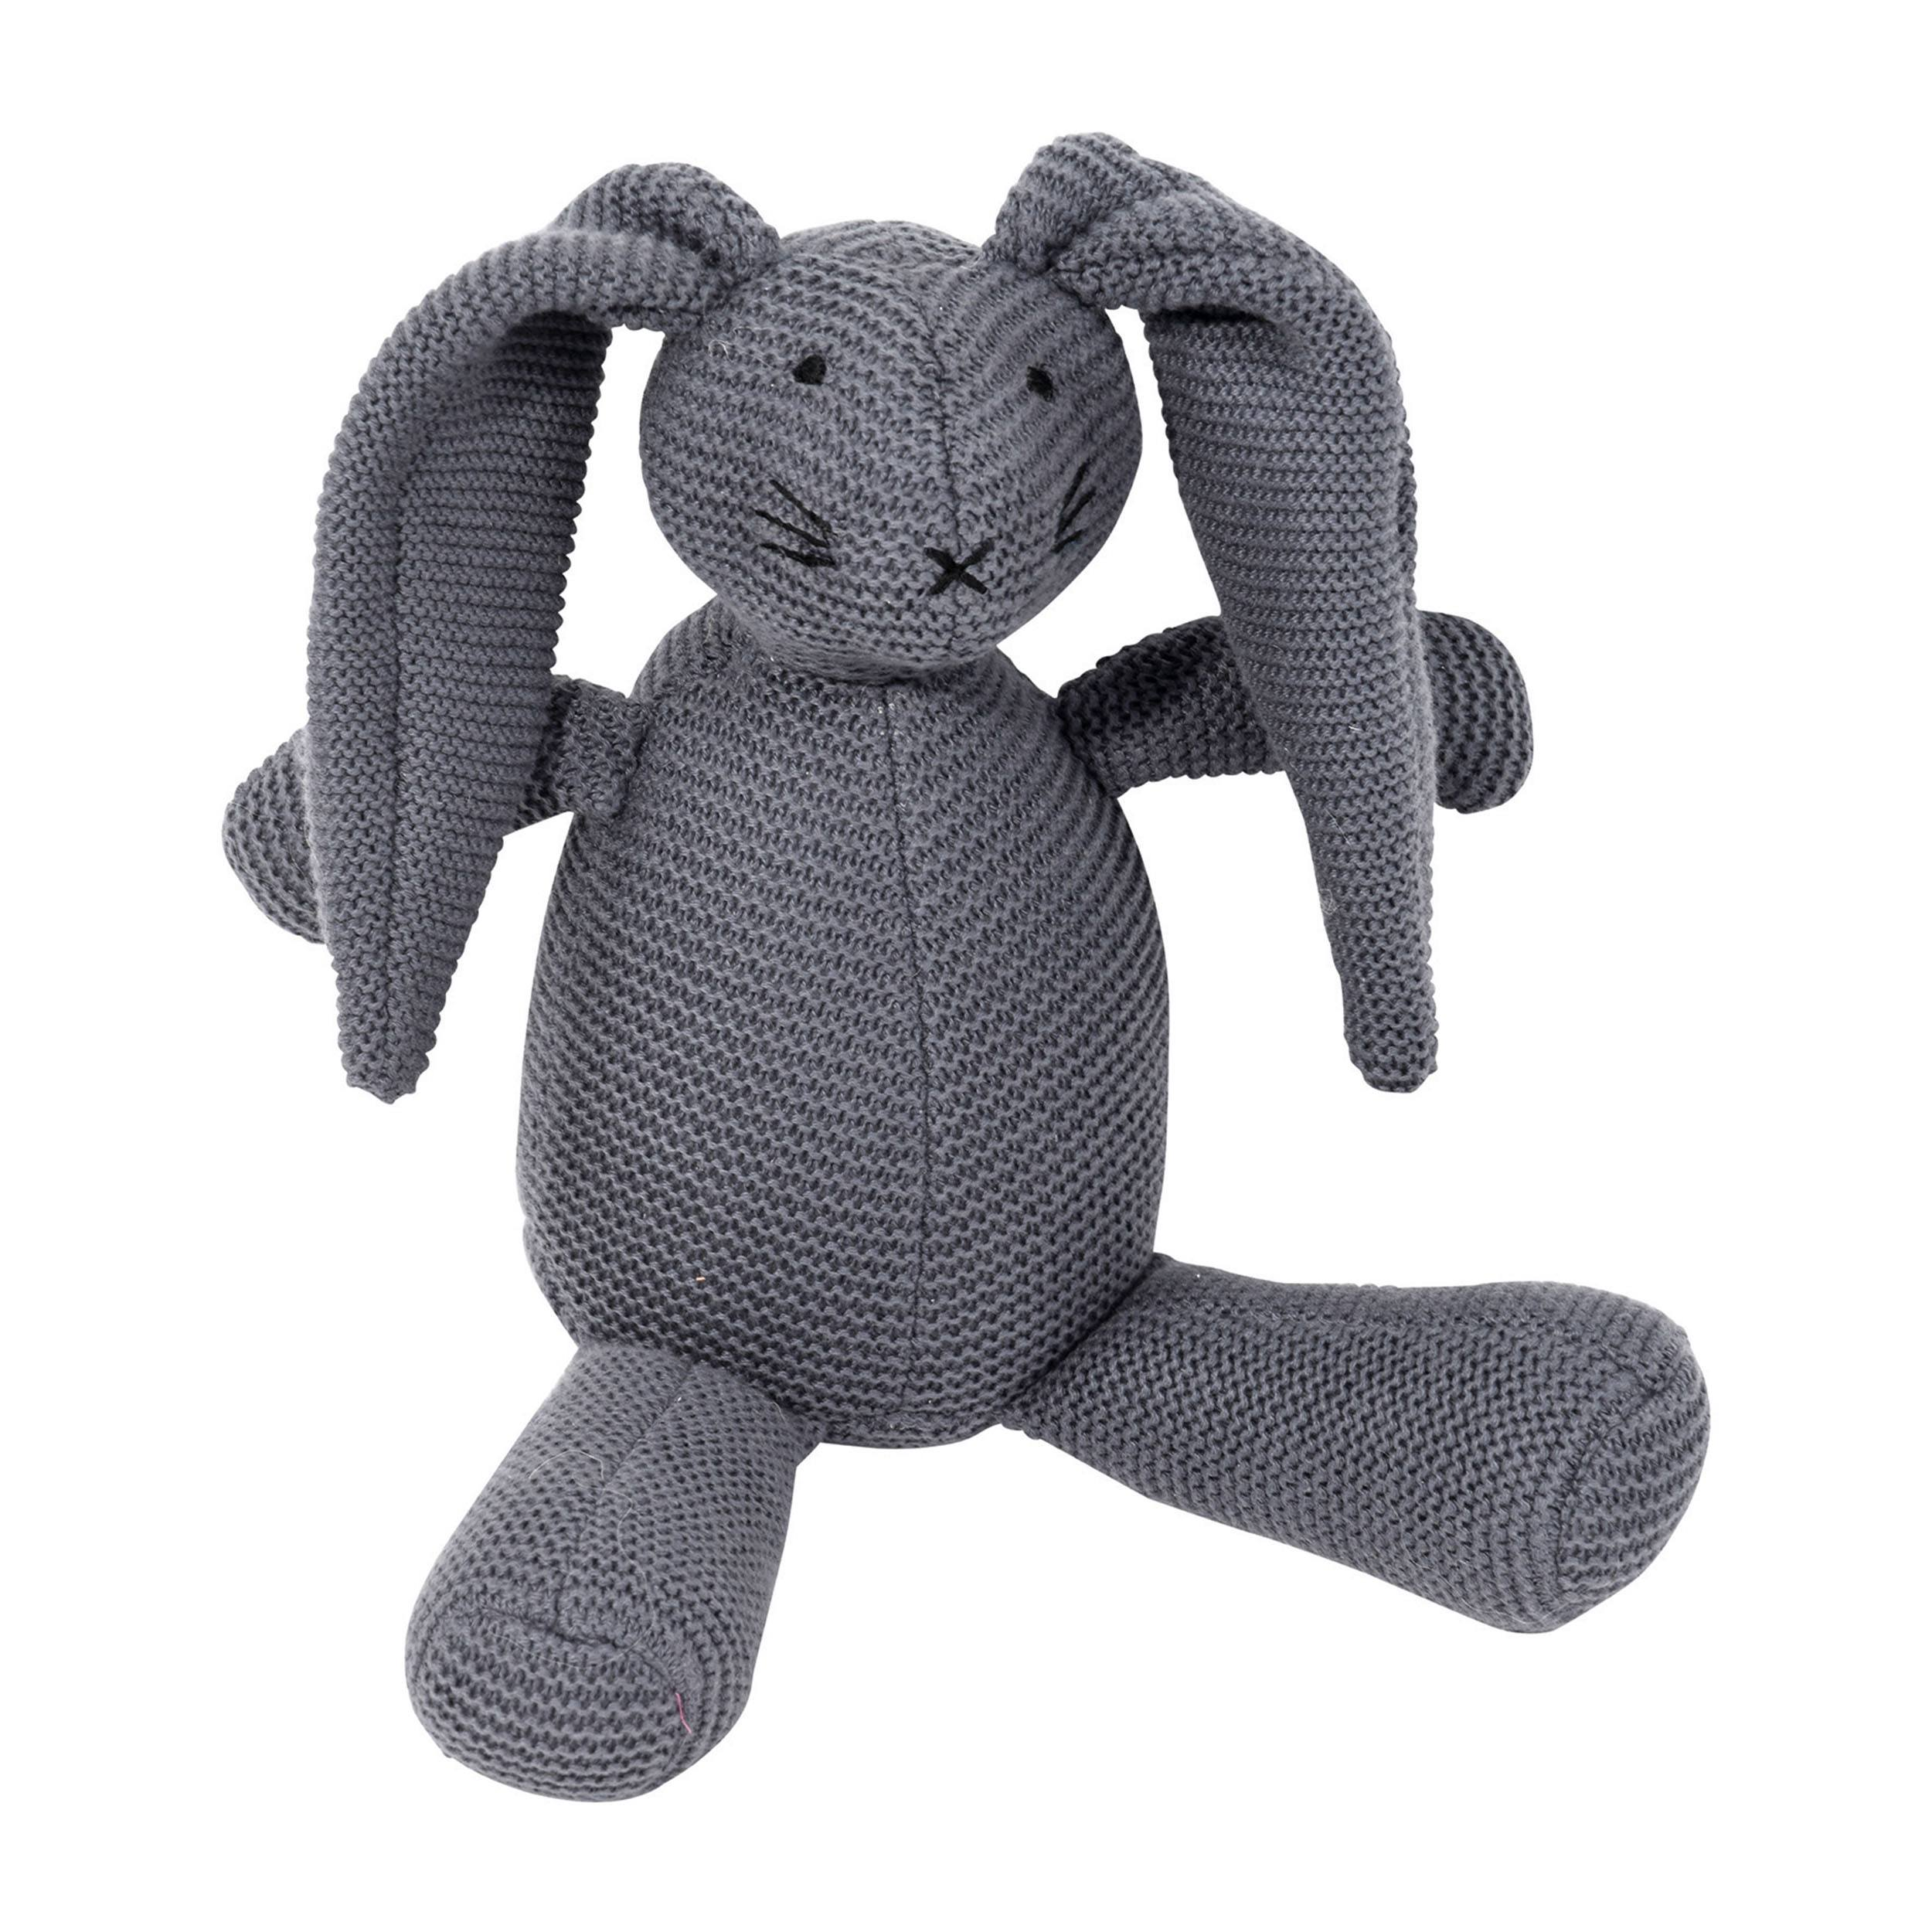 Soft Toy Bunny Kuscheltier